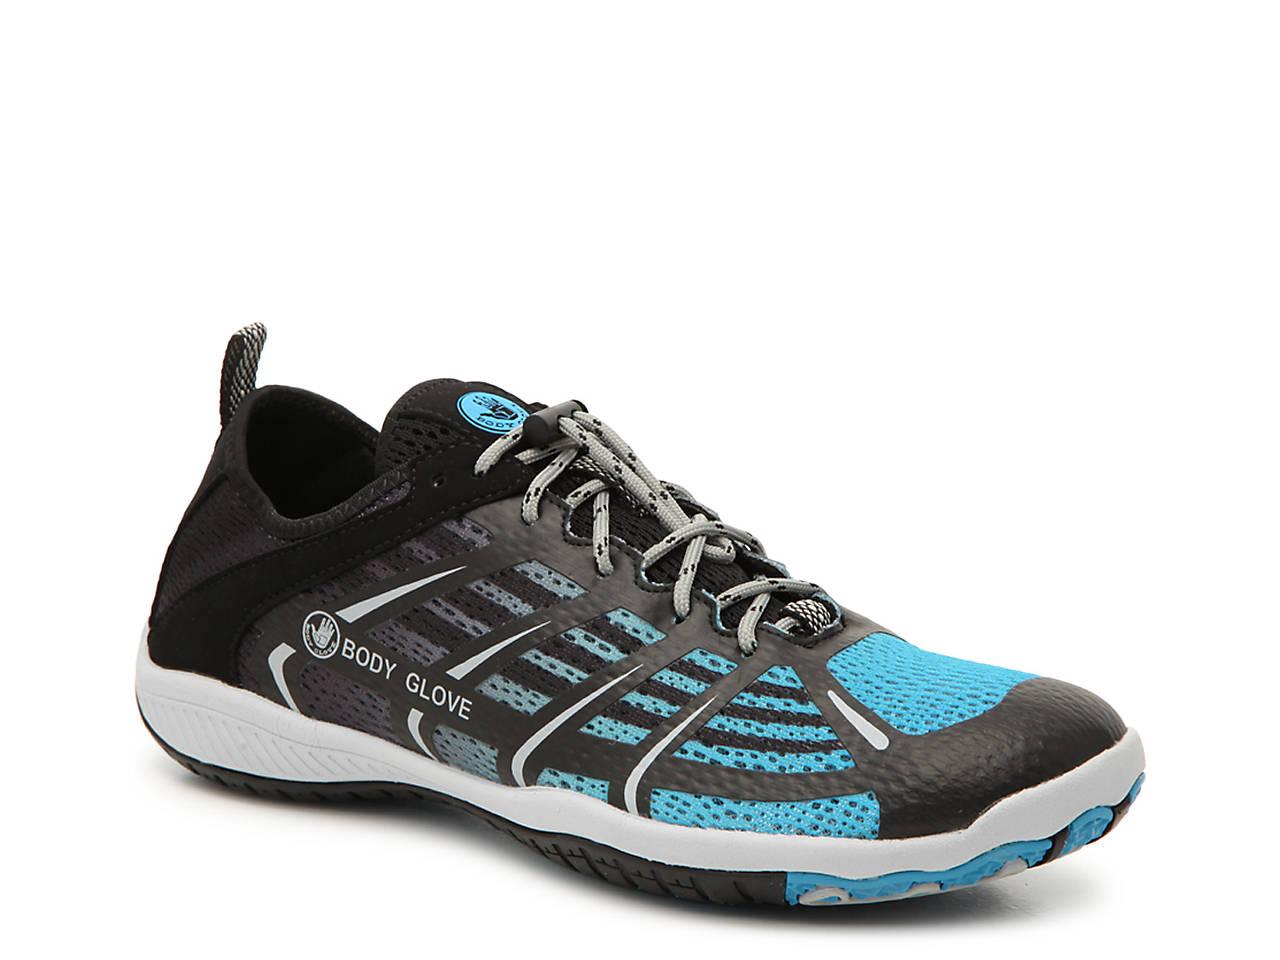 425330660e76 Body Glove Dynamo Rapid Water Shoe Men s Shoes